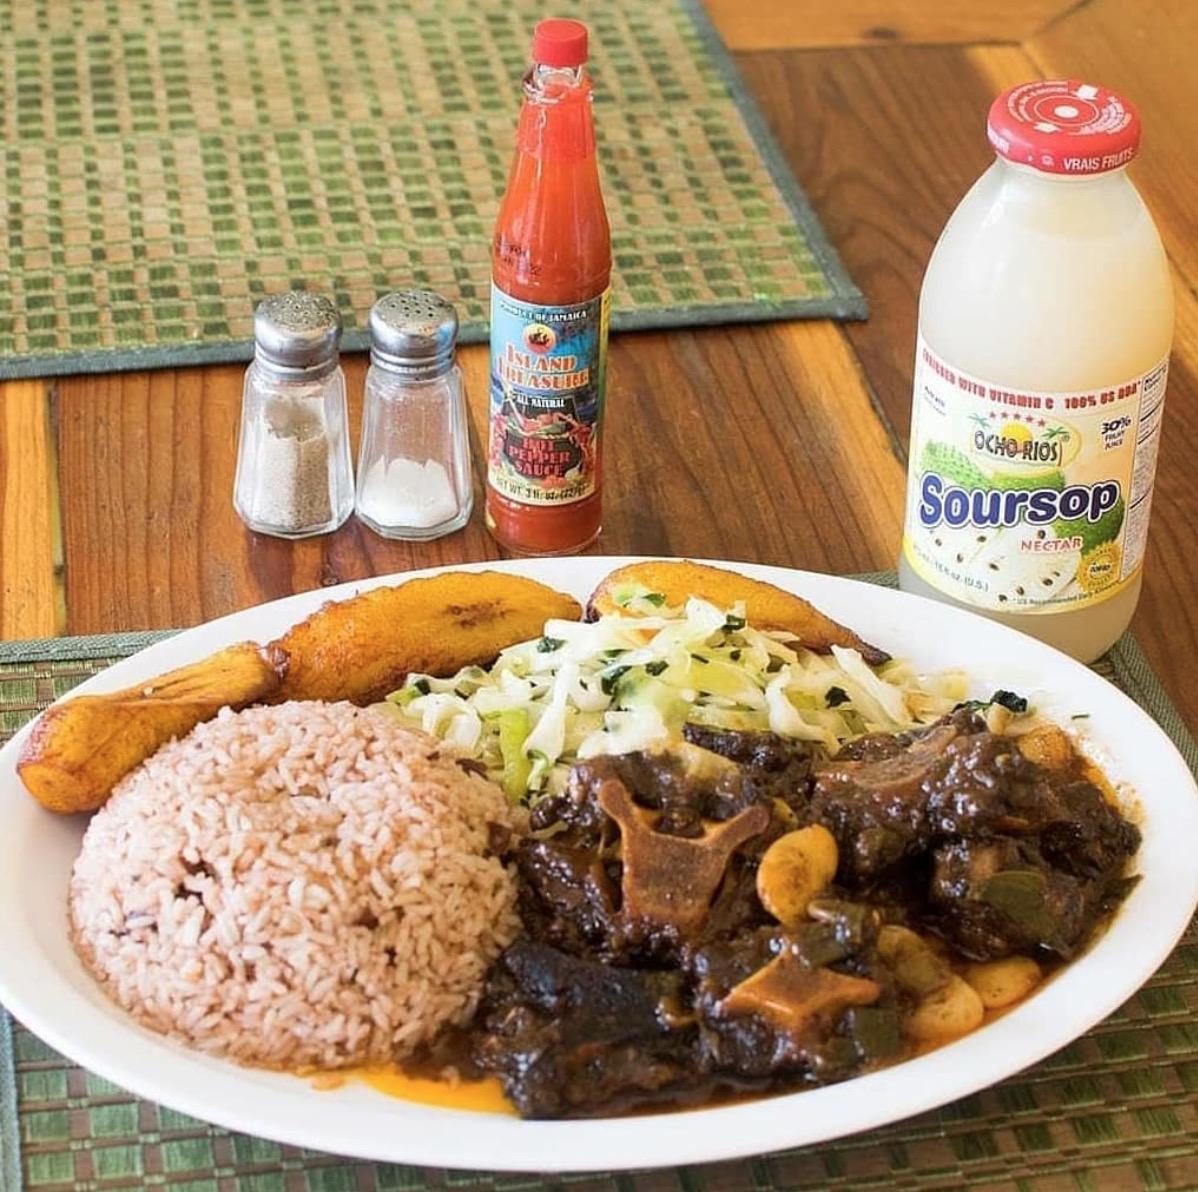 Image via Rock Steady Jamaican Restaurant